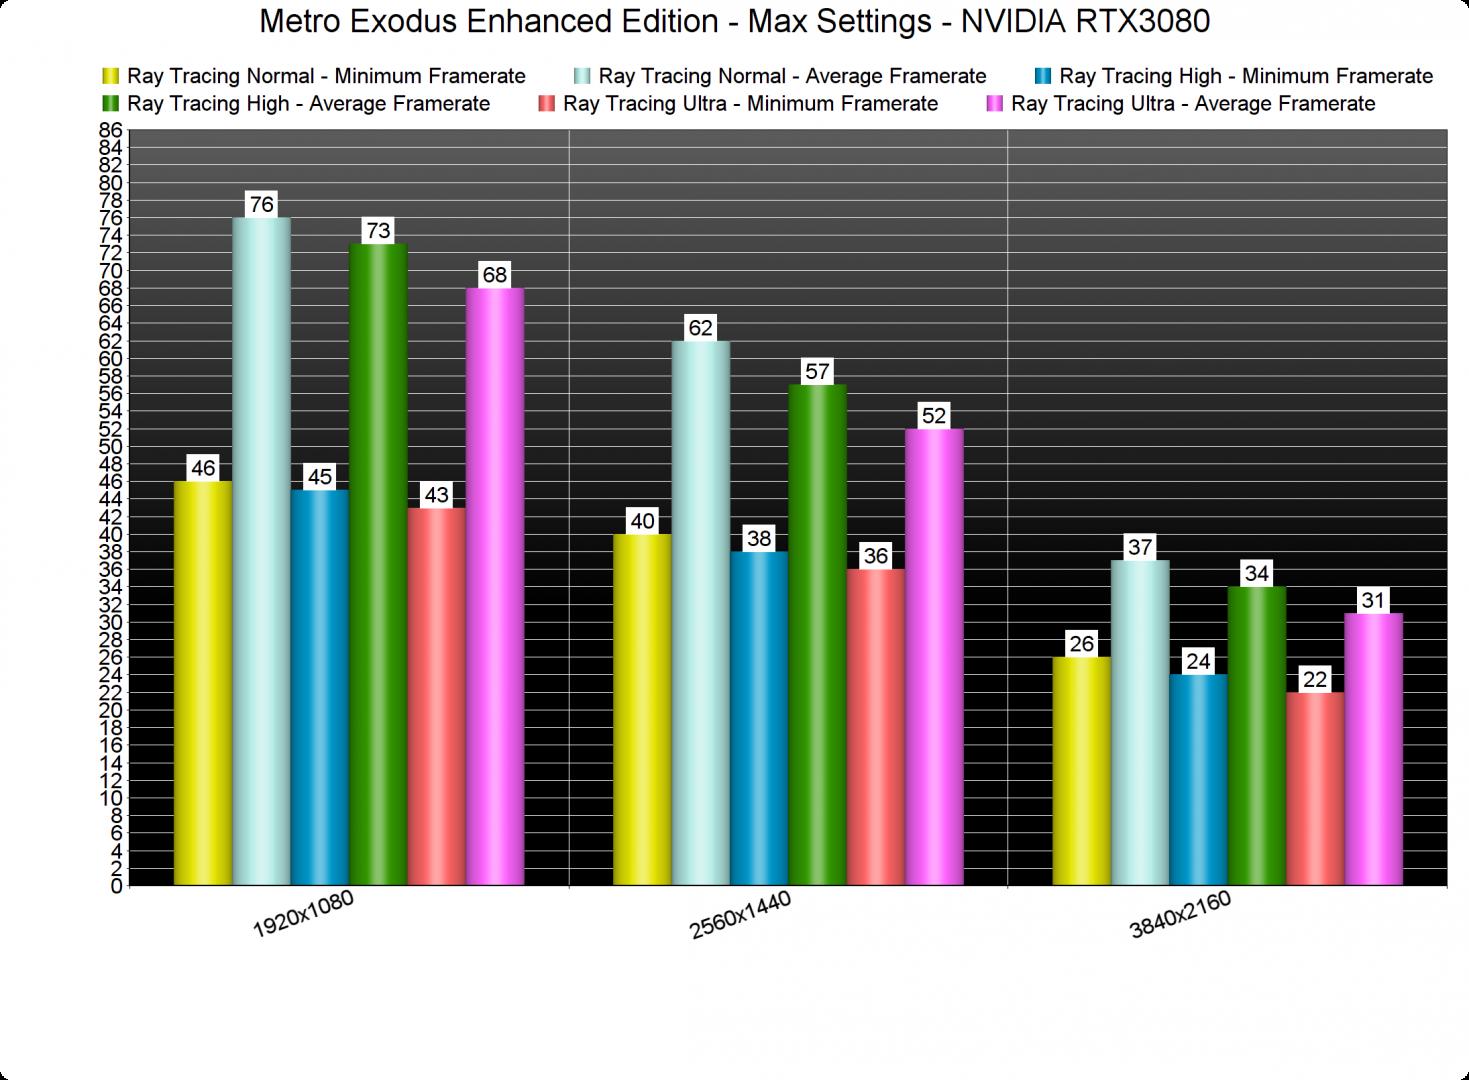 Metro Exodus Enhanced Edition Ray Tracing benchmarks